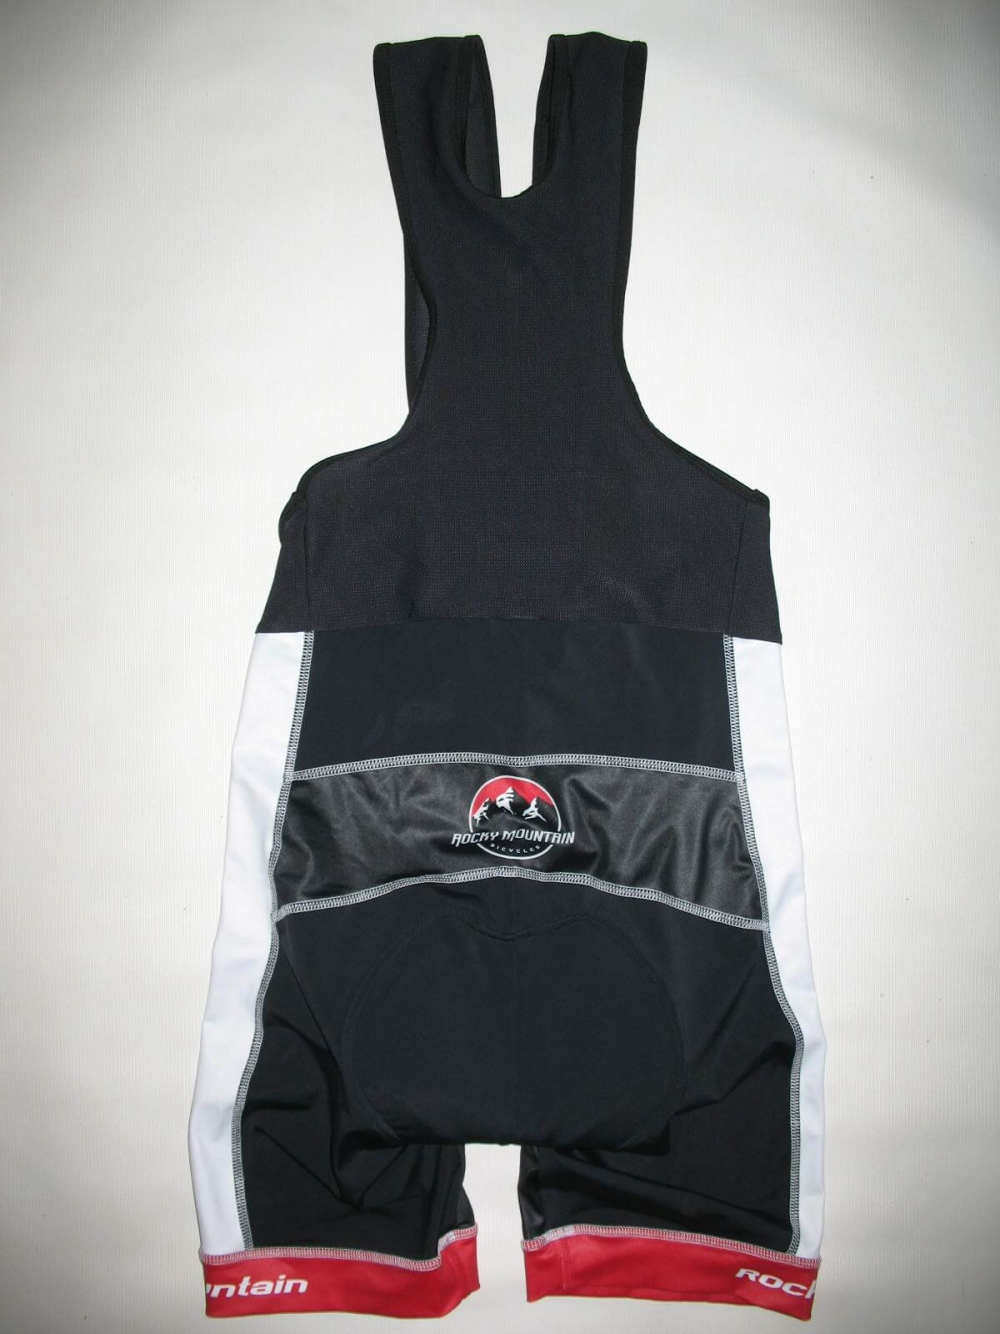 Велошорты CUORE rocky mountain bib shorts (размер M) - 2